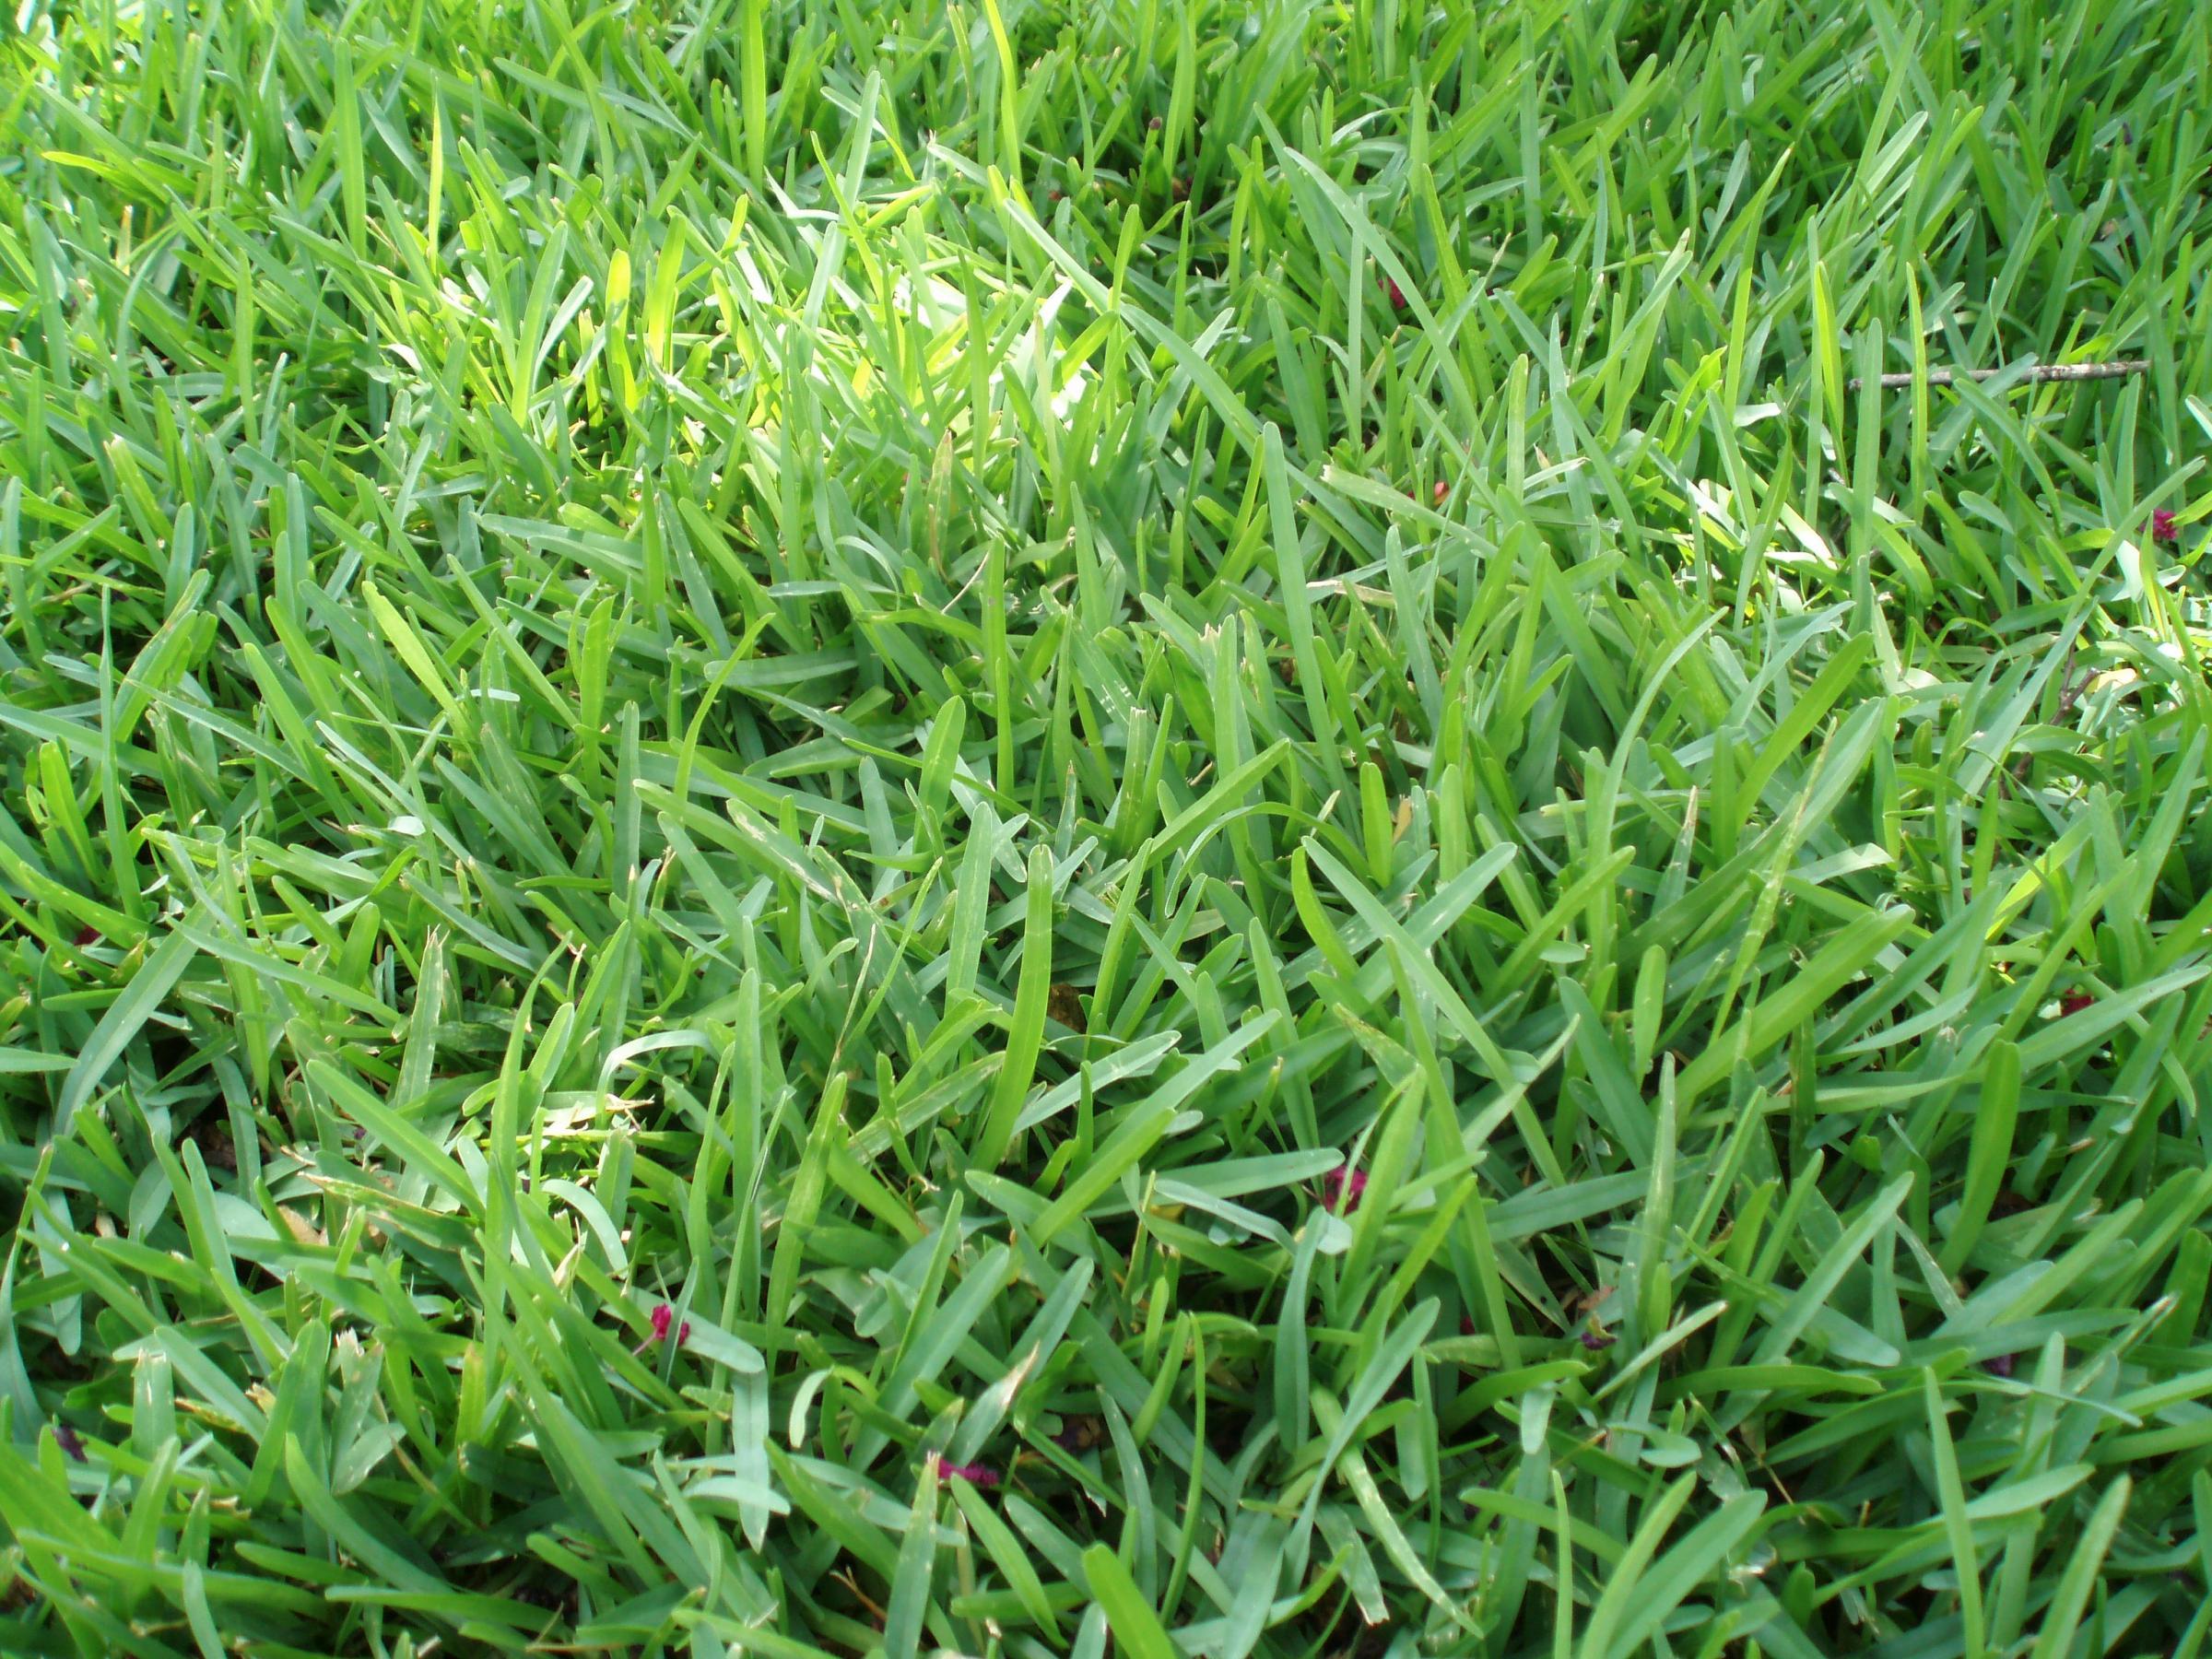 Austin water offers landscaping rebates kut for Landscaping grasses varieties